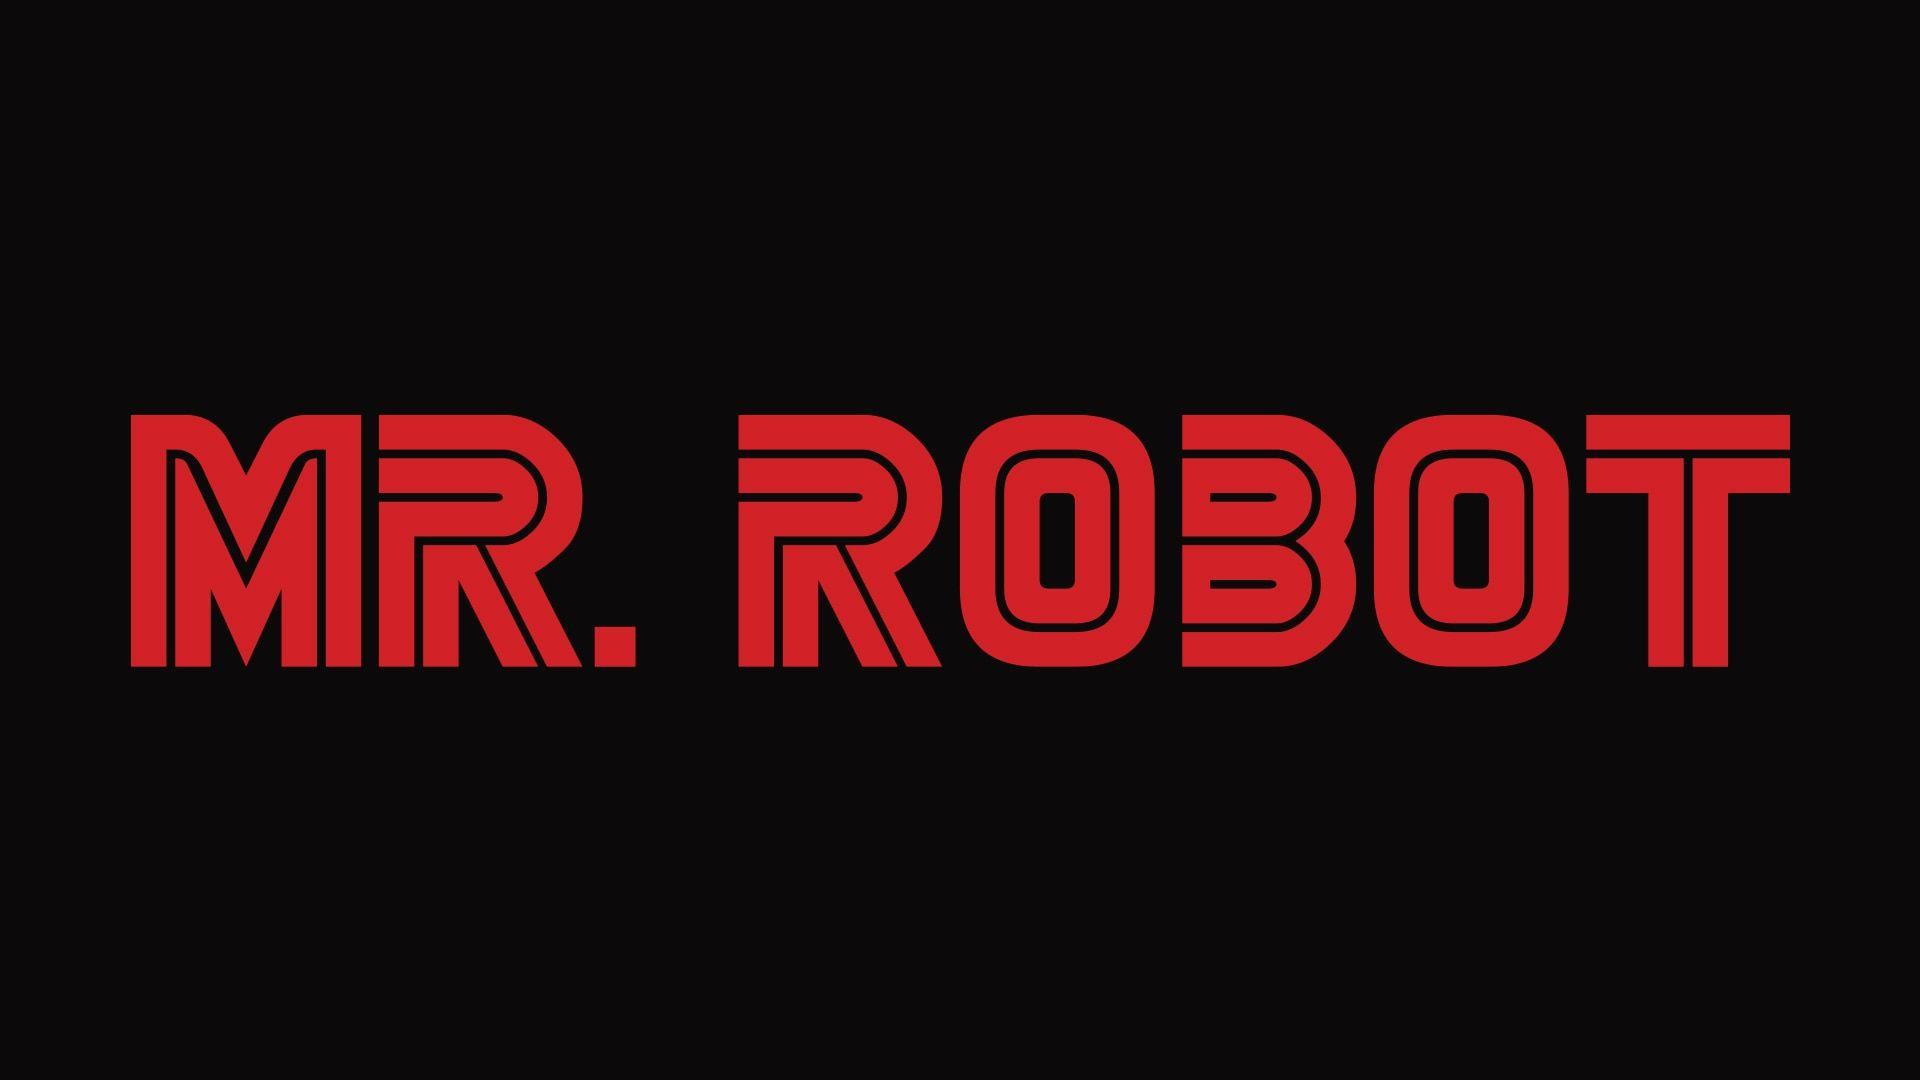 Mr. Robot Mr robot, Mr robot logo, Mr robot season